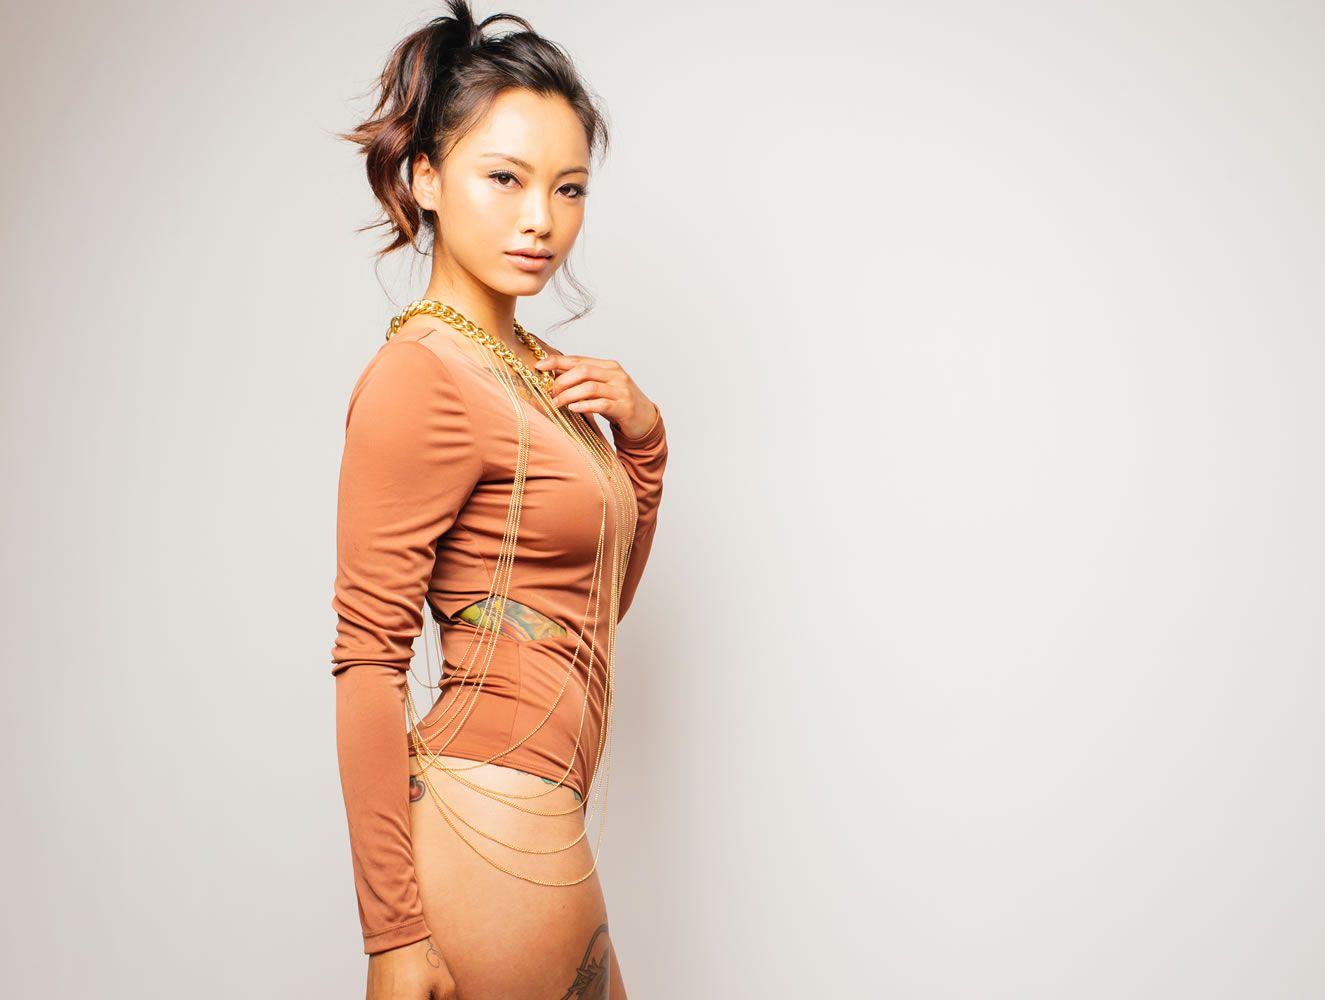 Deng Jie,Kia Goodwin Adult clips Nellie Bellflower,Sandra Purpuro